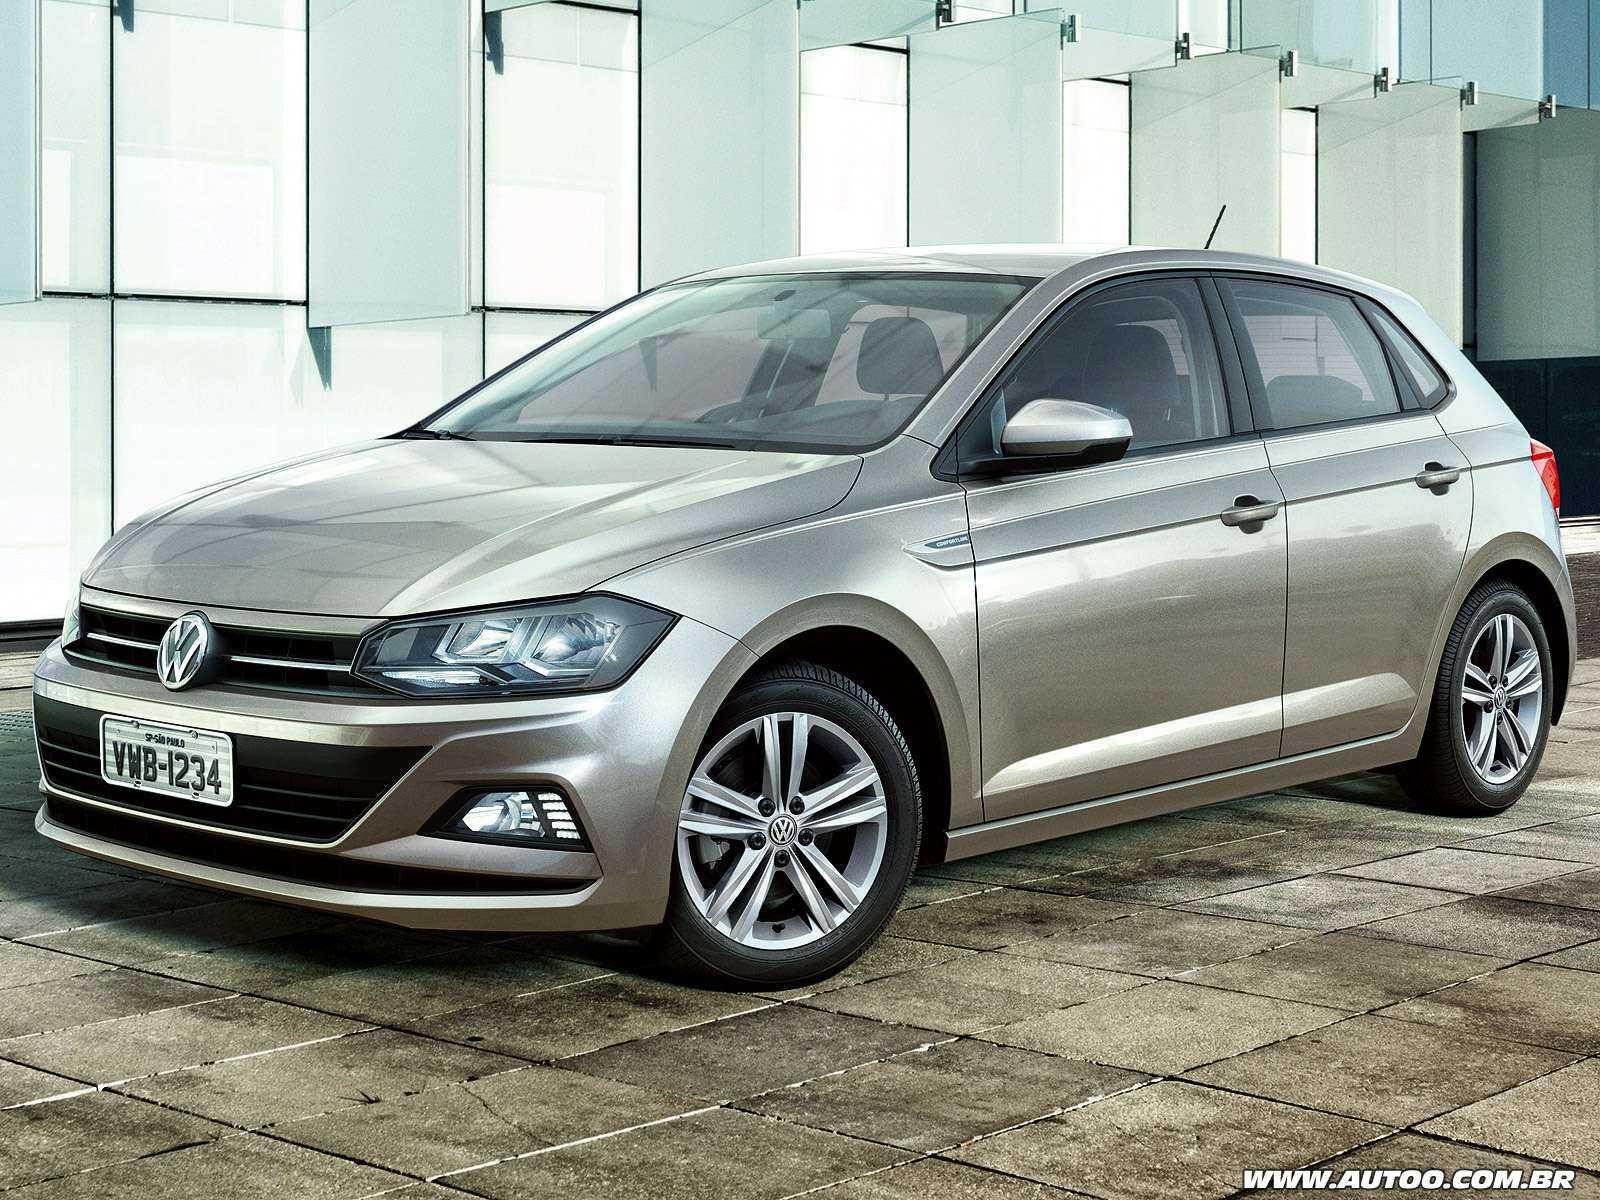 VolkswagenPolo 2018 - ângulo frontal